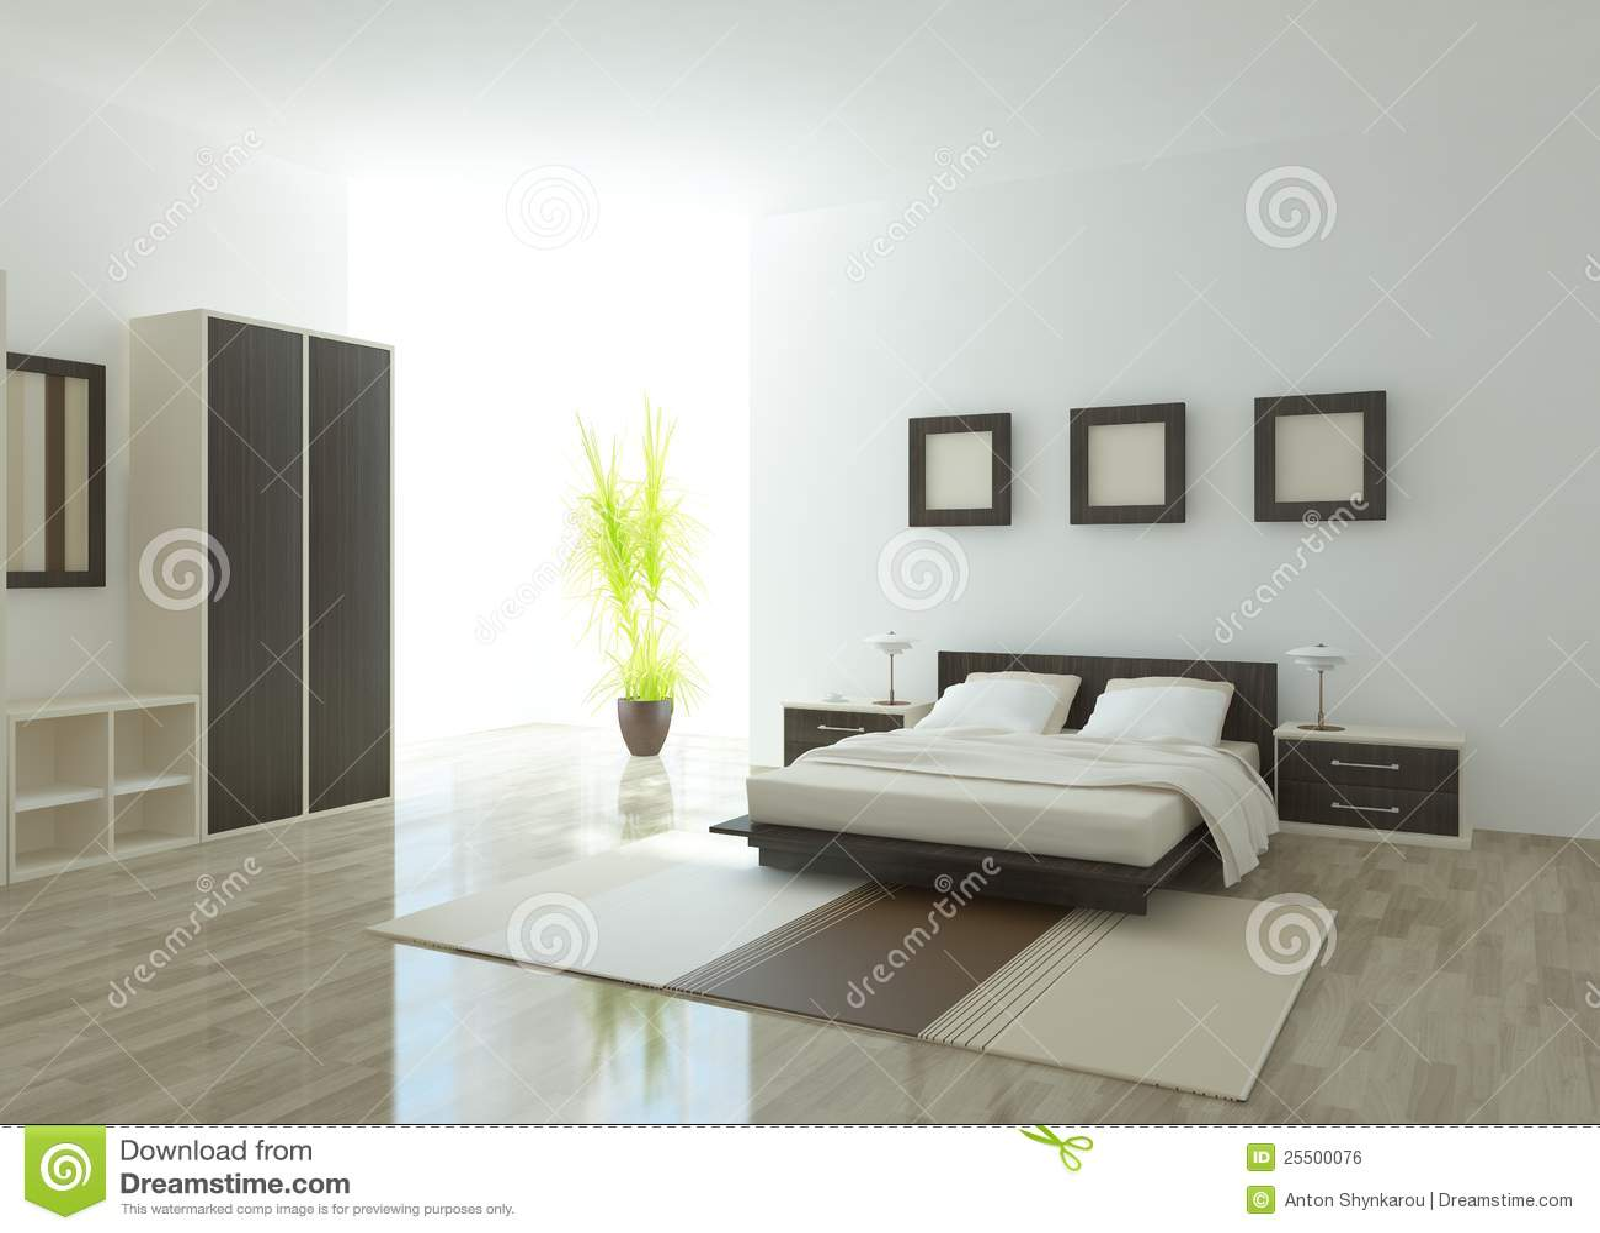 Modern Bedroom Interior Modern Bedroom Interior Royalty Free Stock Image Image 25500076